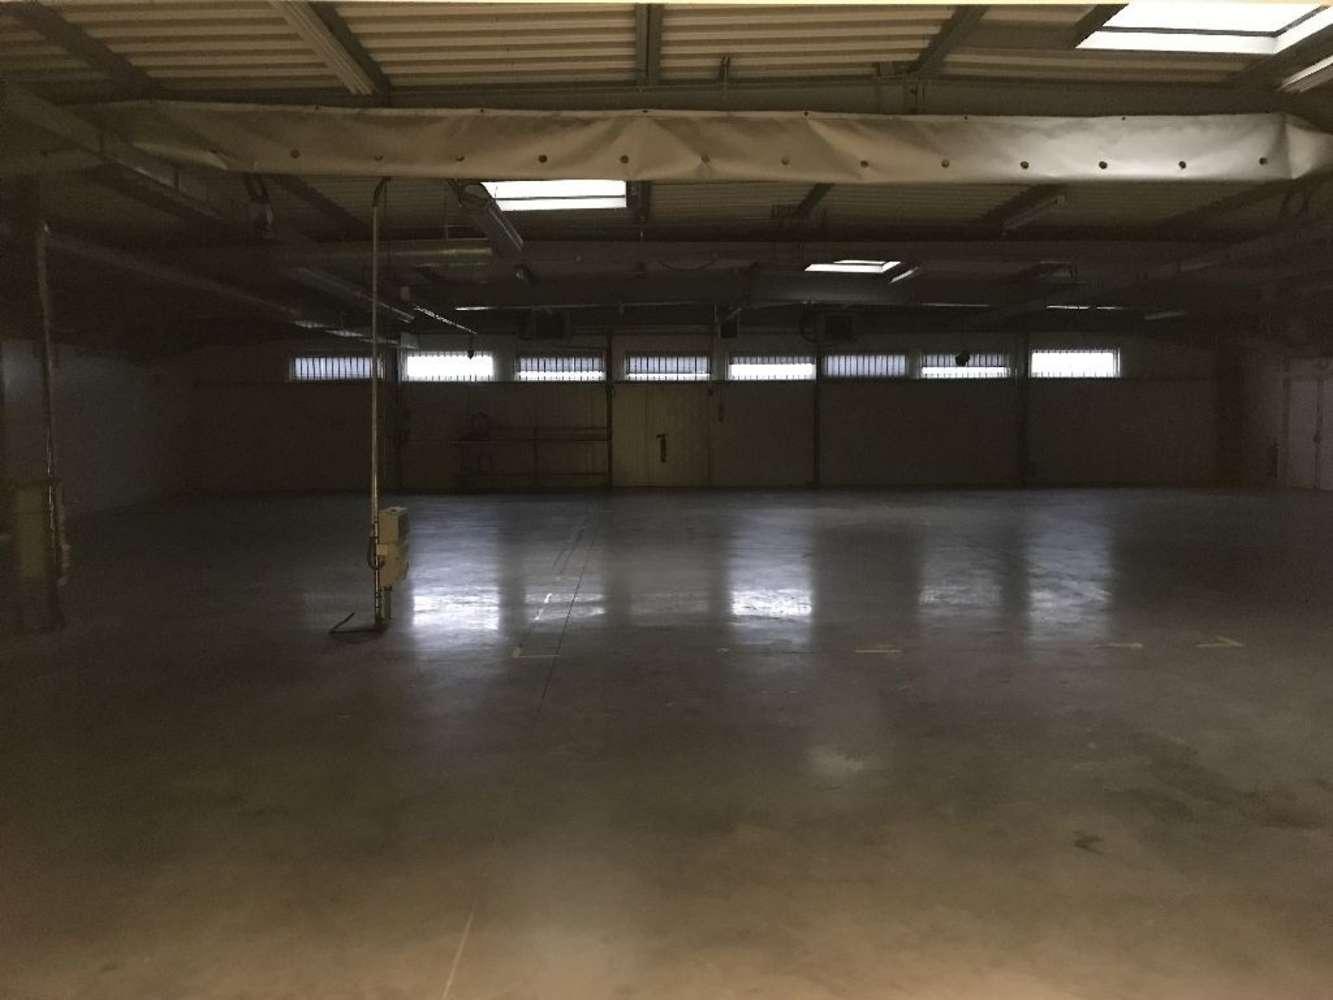 Activités/entrepôt Meyzieu, 69330 - Entrepot à vendre Meyzieu (Lyon Est) - 9862438